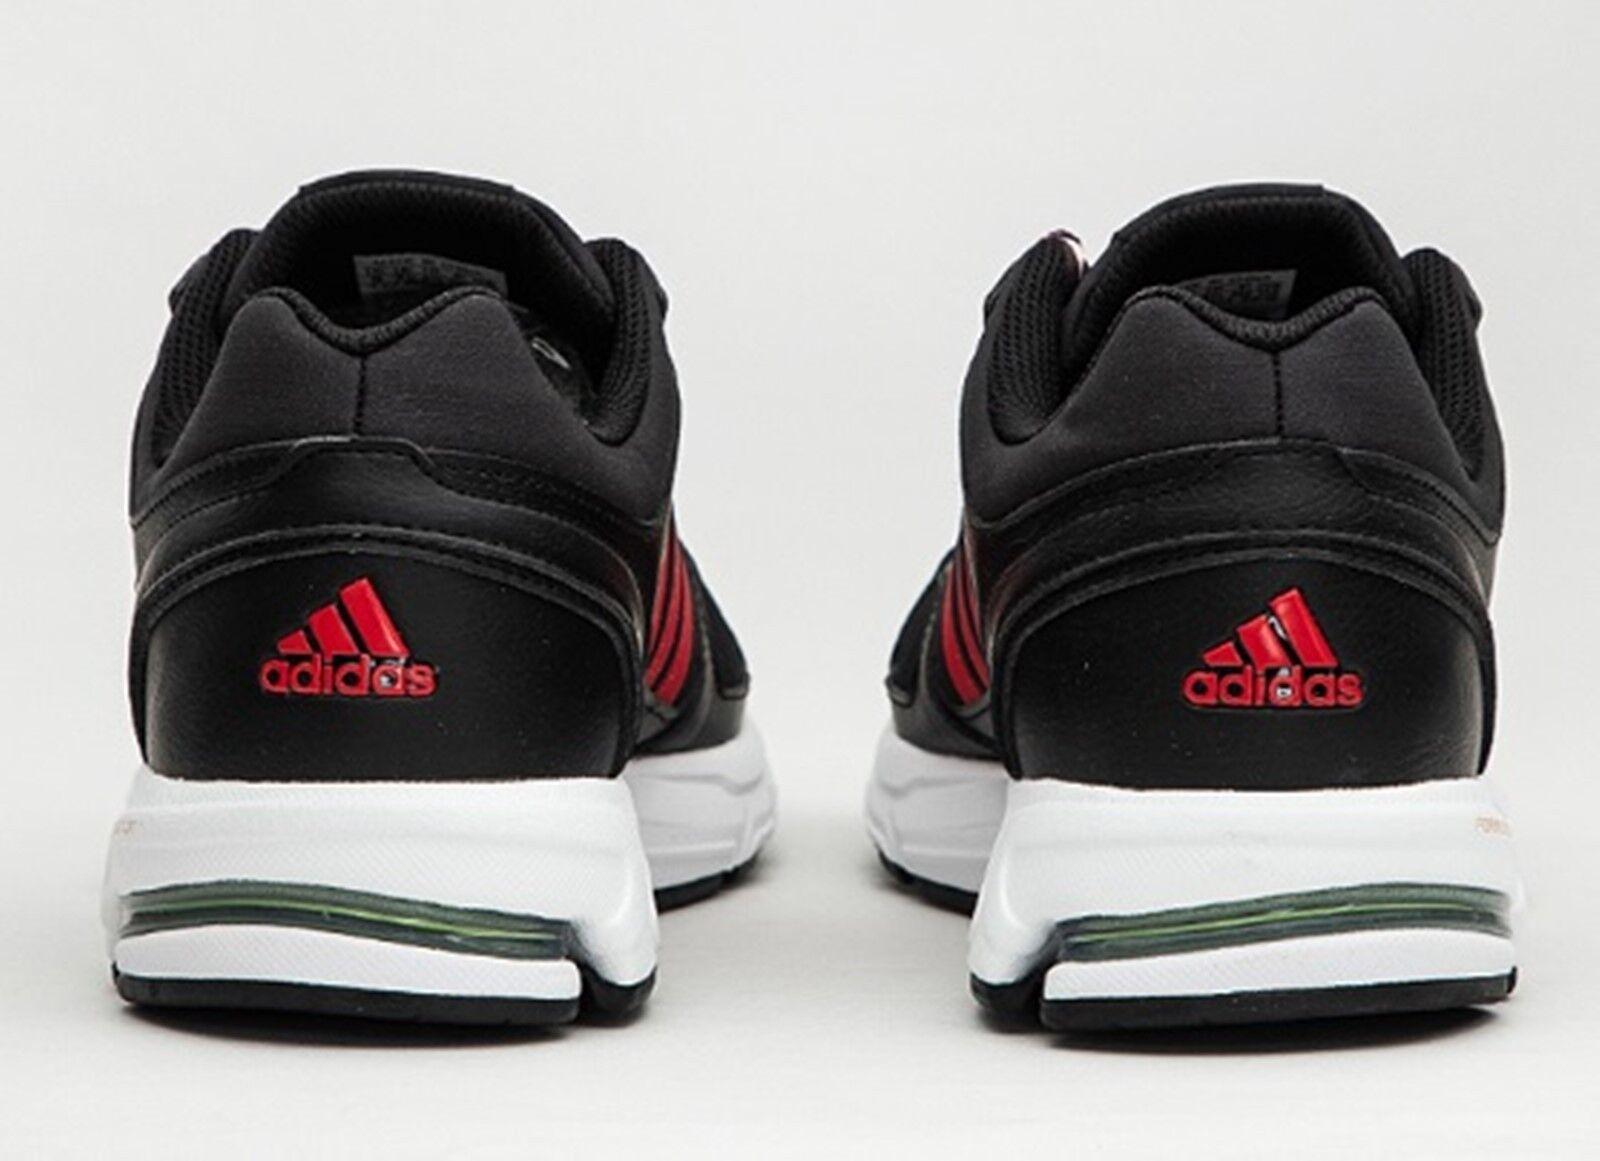 Adidas Men Equipment 10 10 10 Formotion shoes Running Black Sneakers GYM shoes B96535 923e3b